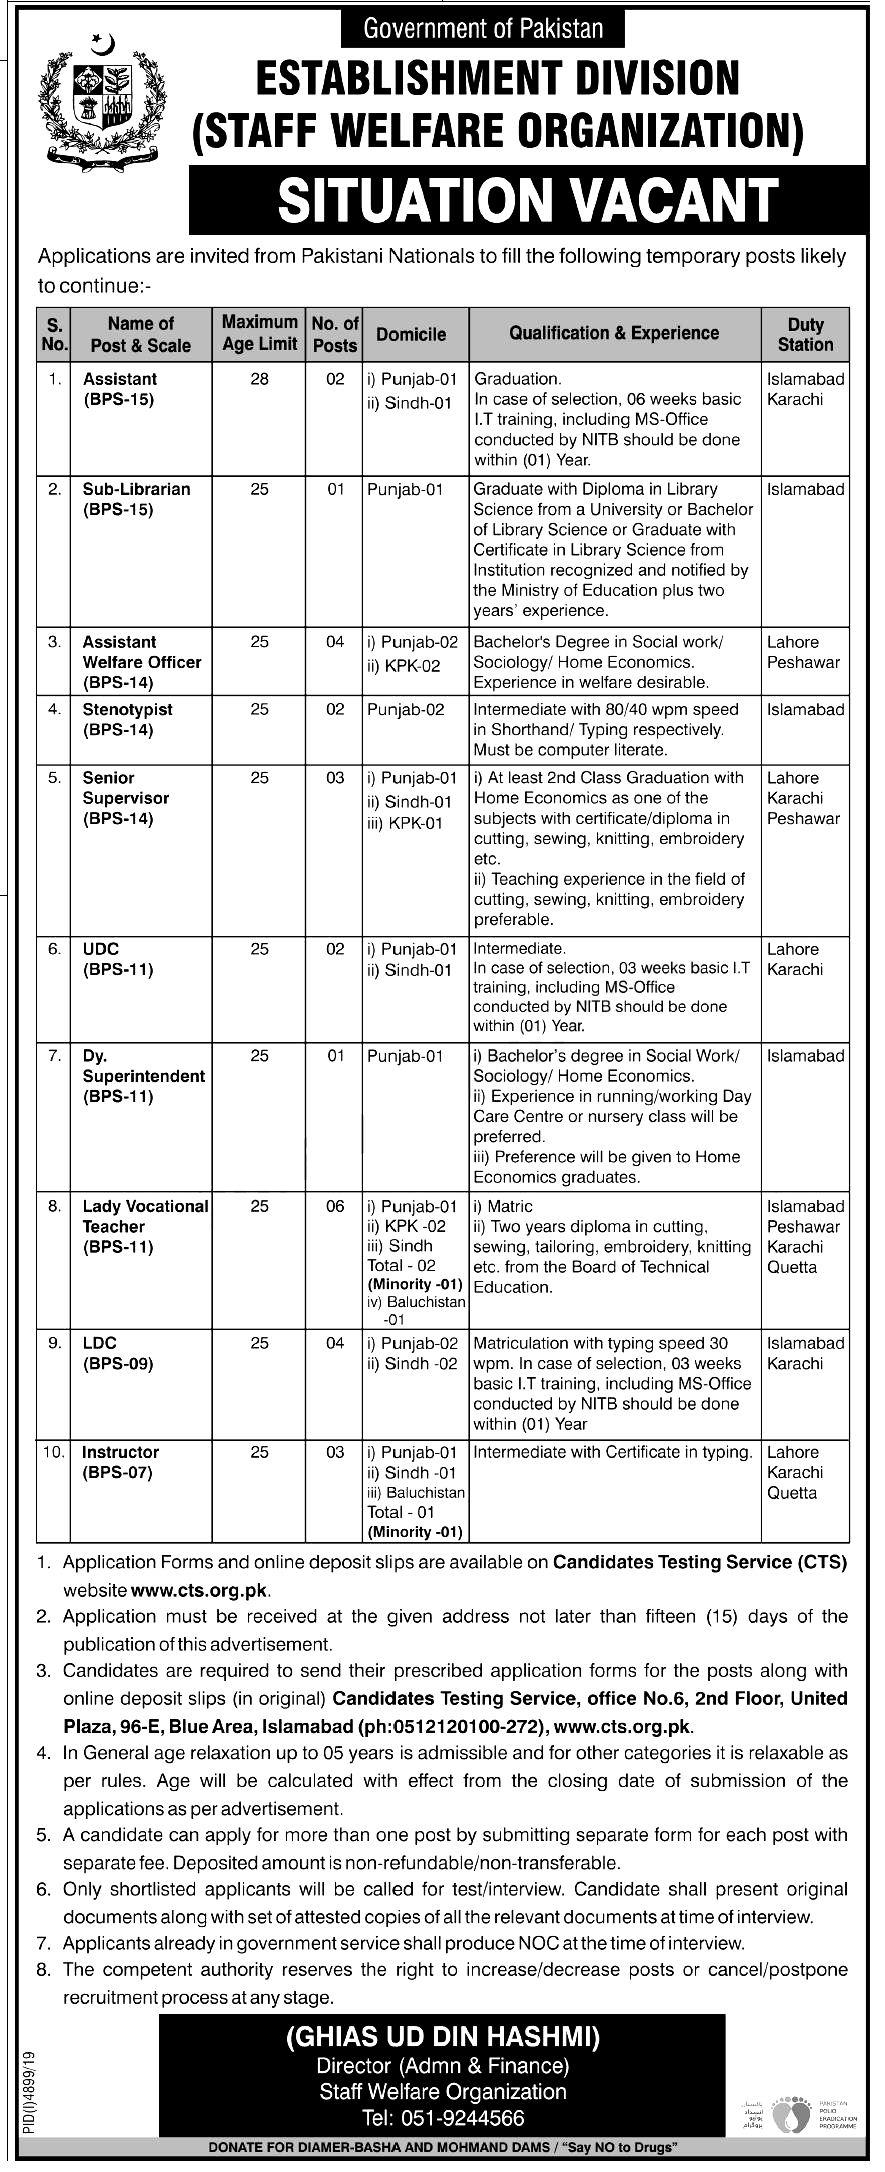 Establishment Division Staff Welfare Organization CTS jobs 2020 Applying Date Eligibility Criteria